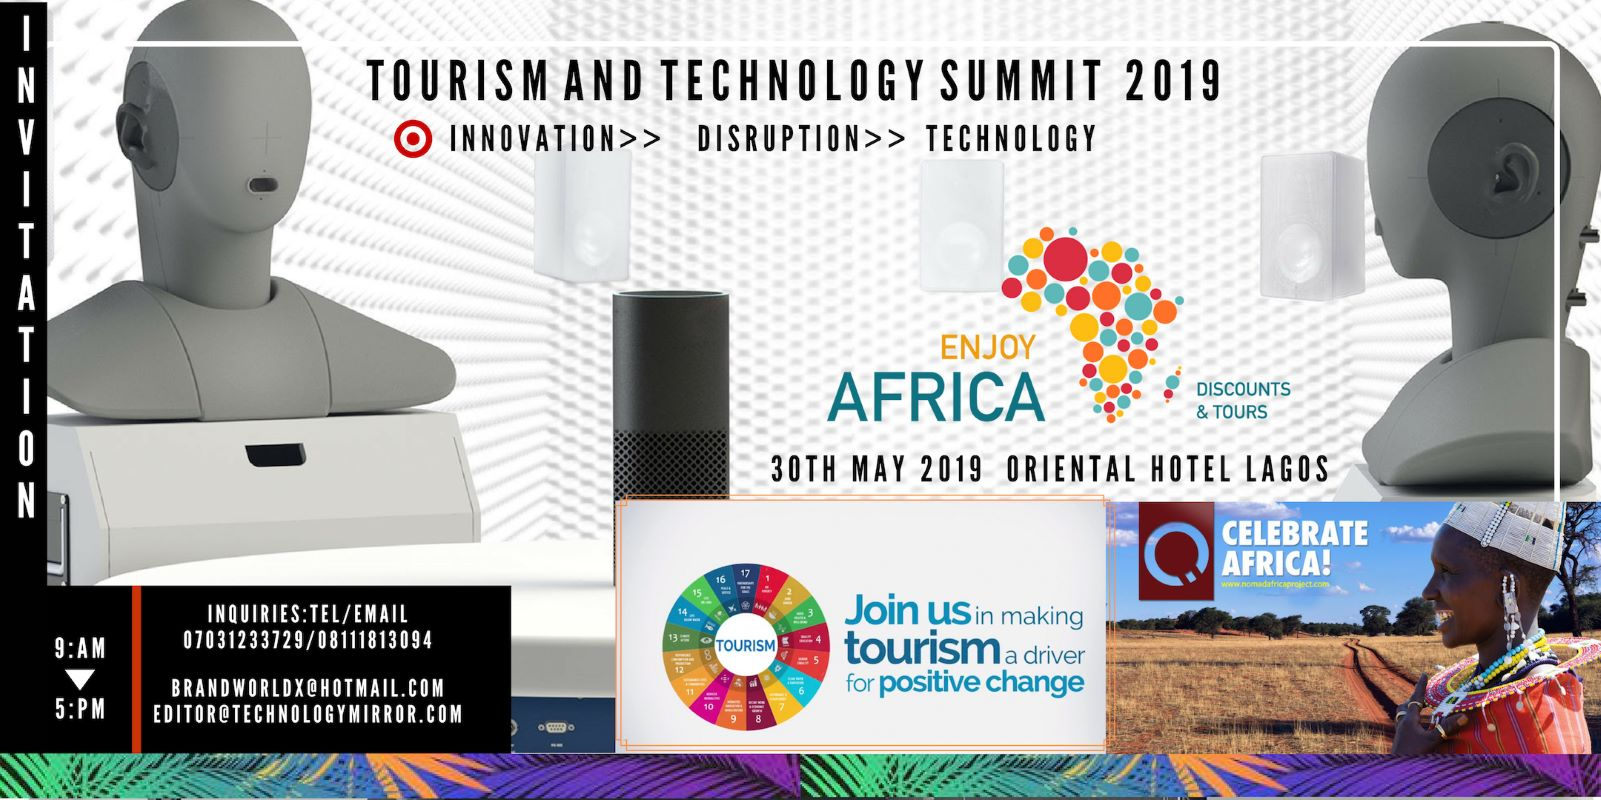 TOURISM AND TECHNOLOGY SUMMIT 2019, Lagos, Nigeria